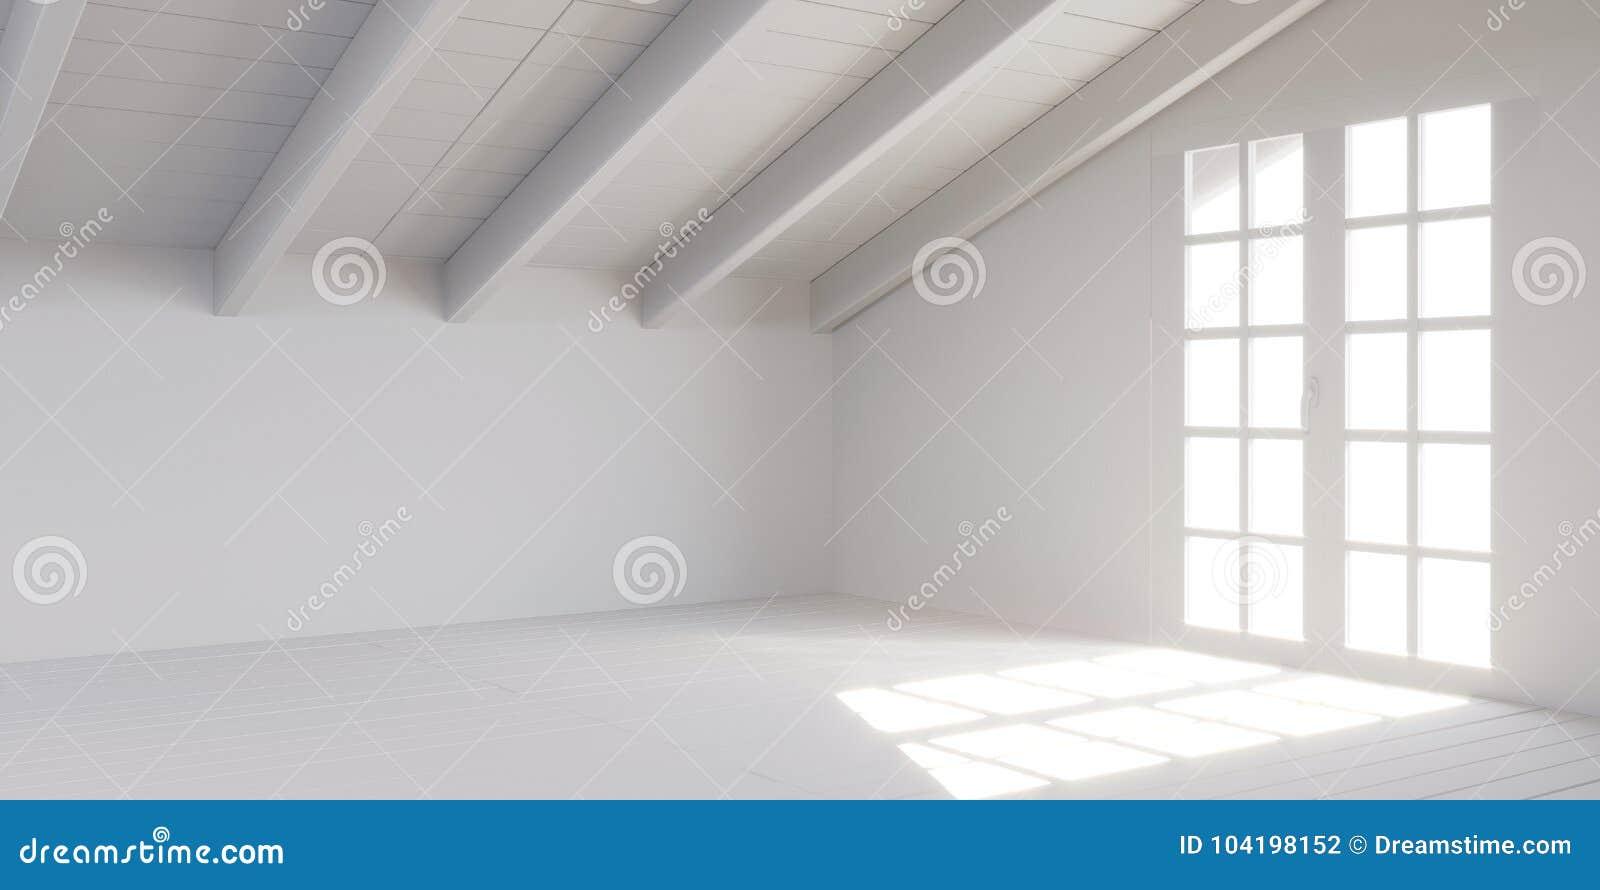 White empty room in attic with wooden door and lumber roof. 3D rendering.